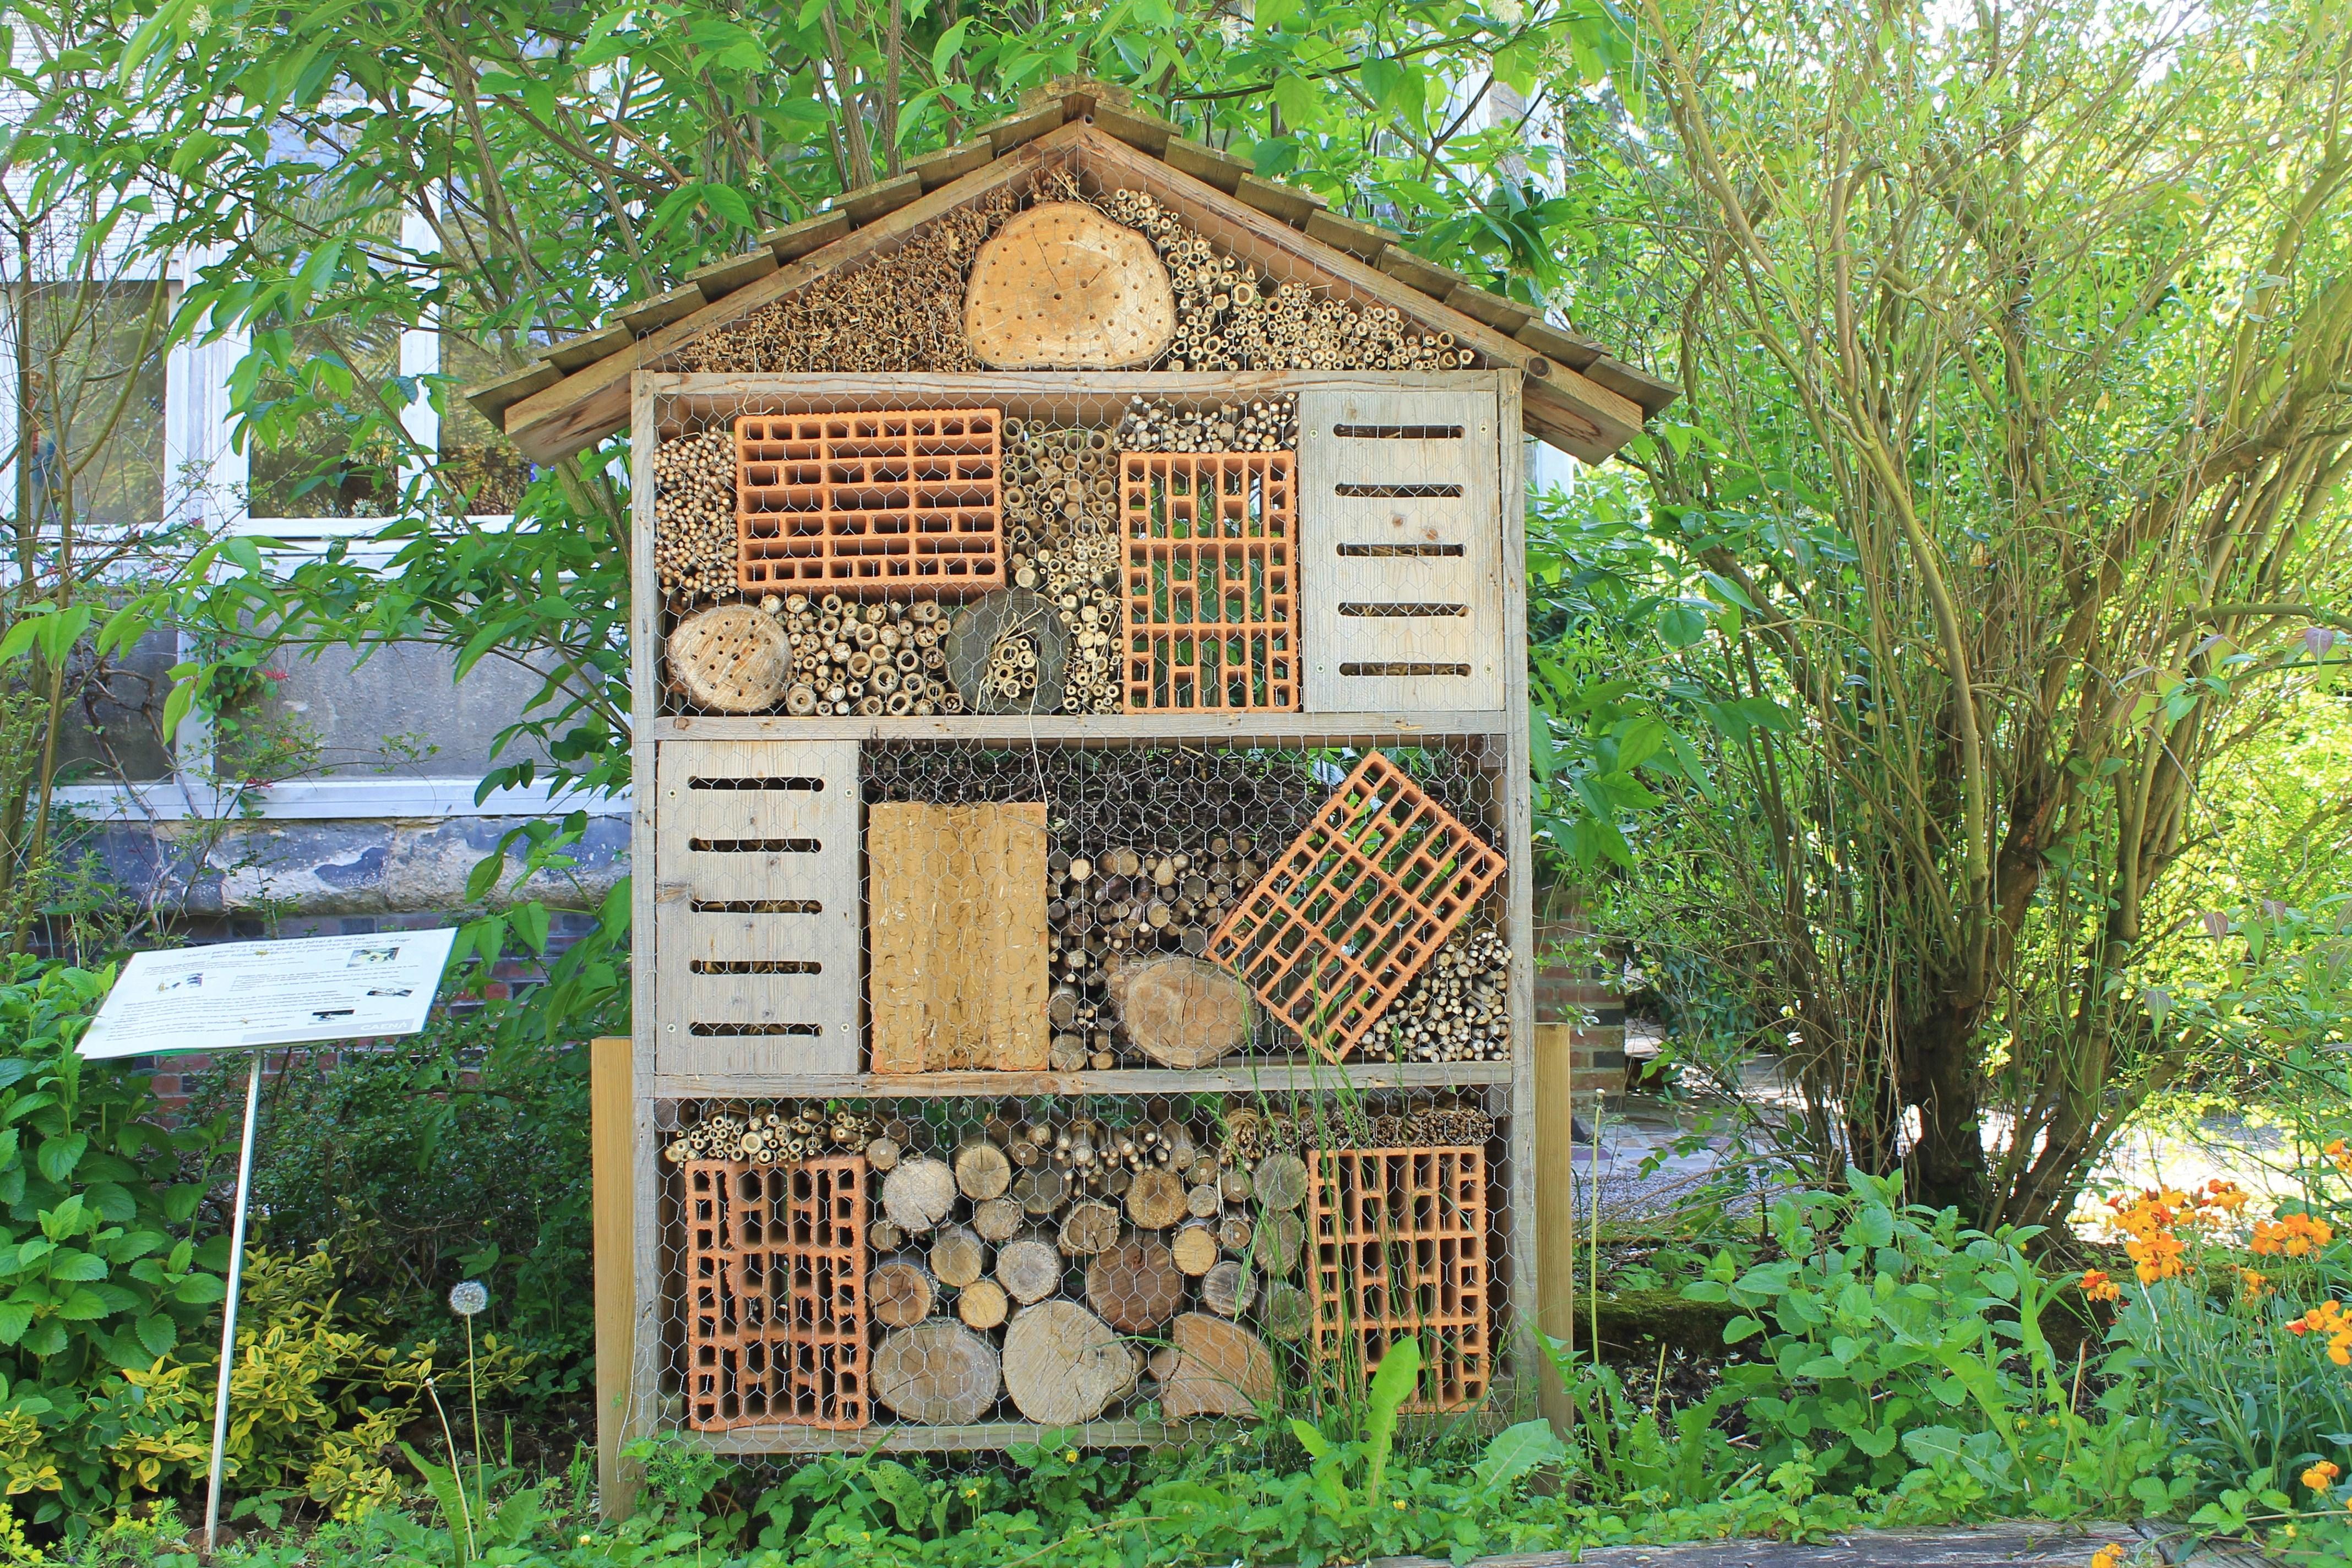 file caen jardin des plantes h tel wikimedia commons. Black Bedroom Furniture Sets. Home Design Ideas